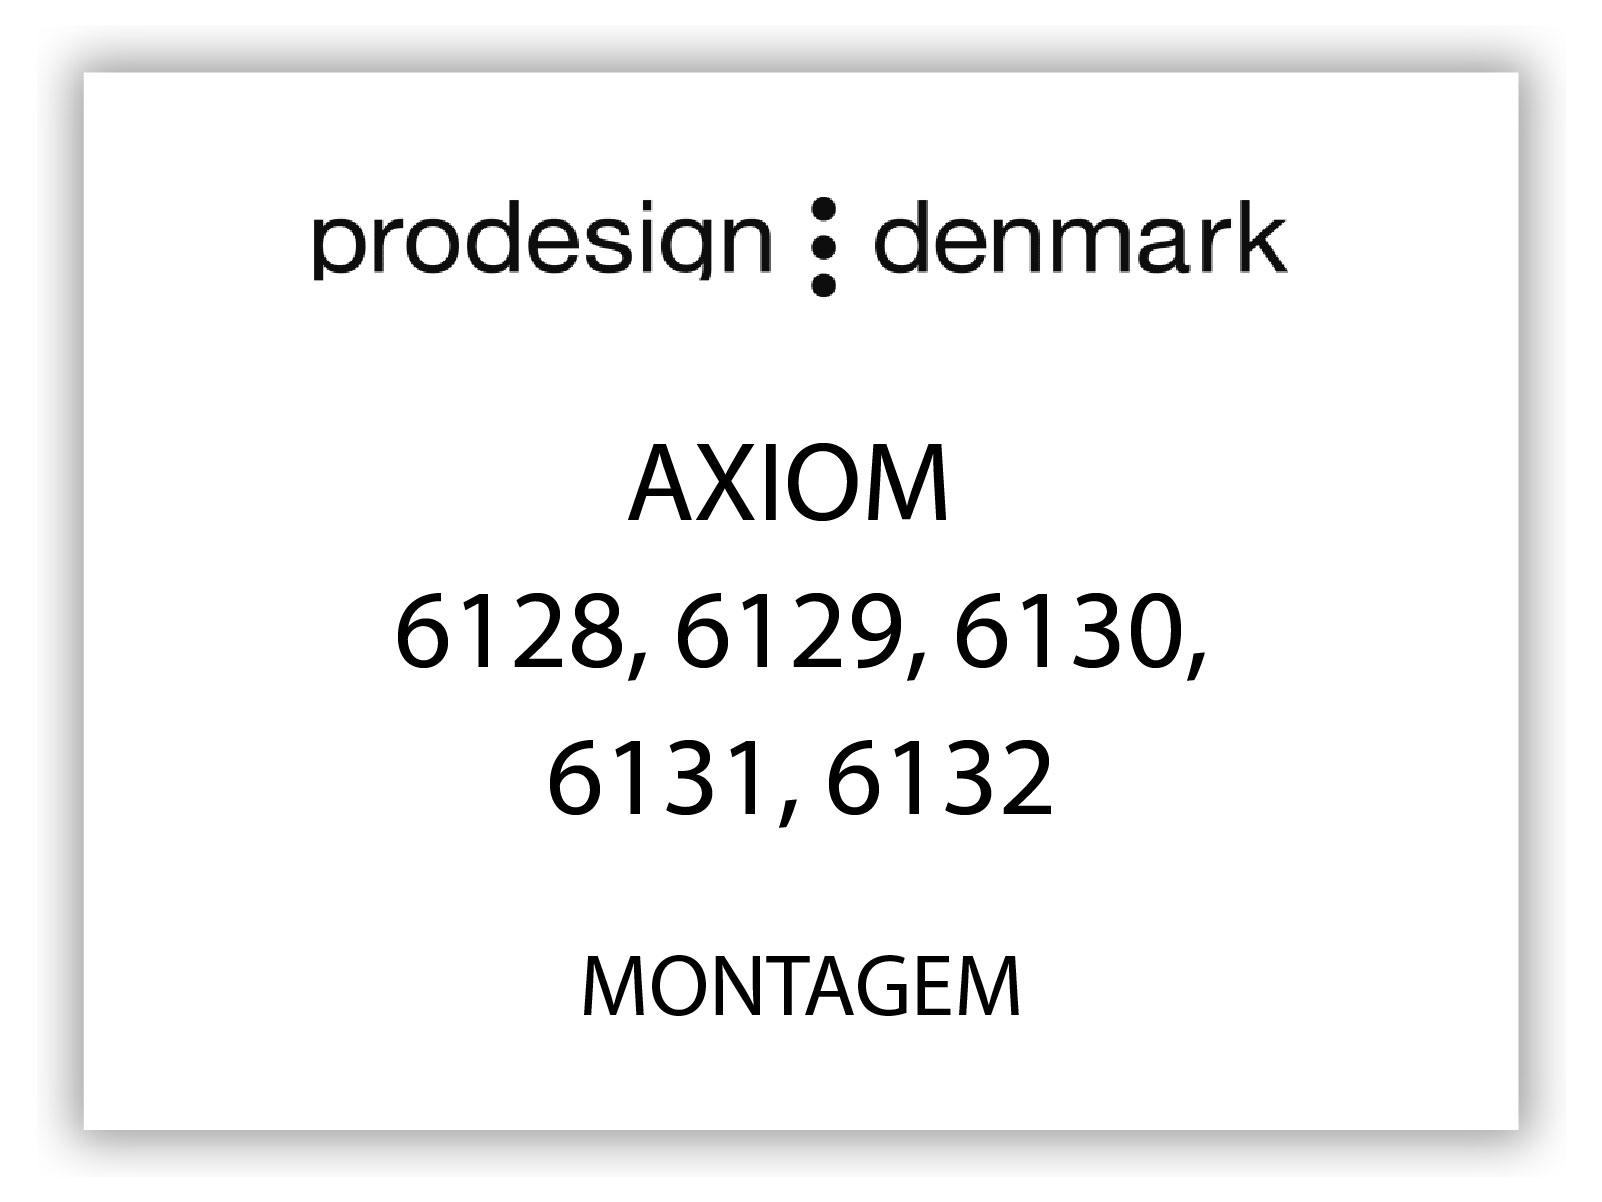 ProDesignDenamark_capa-AXIOM 6128, 6129, 6130, 6131, 6132-MONT